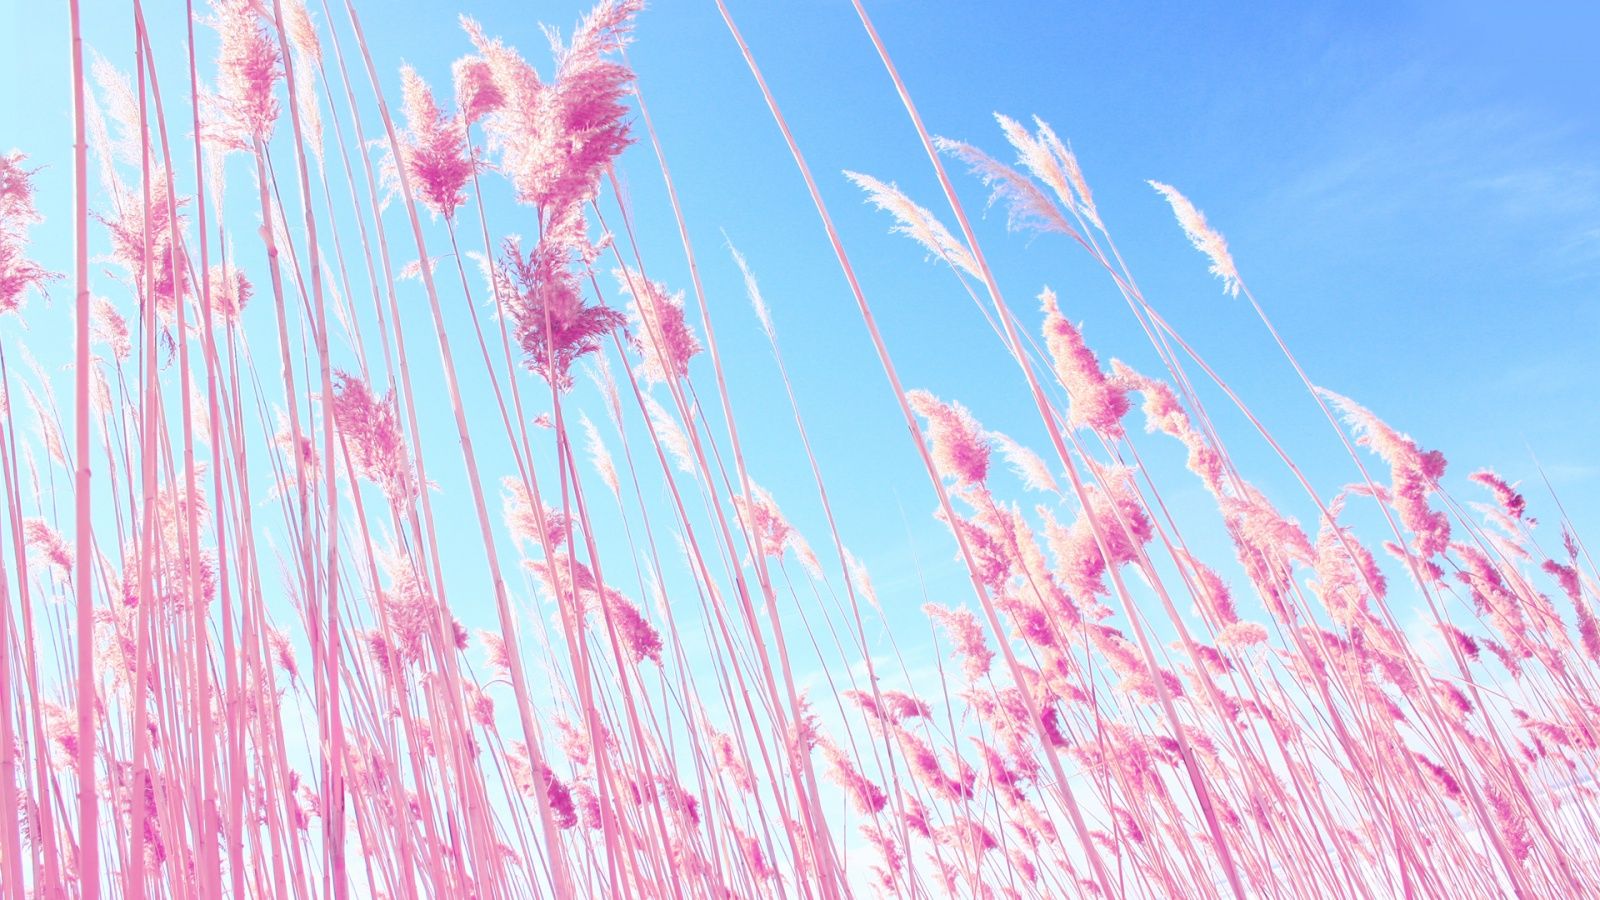 hp wallpaper pink - photo #8